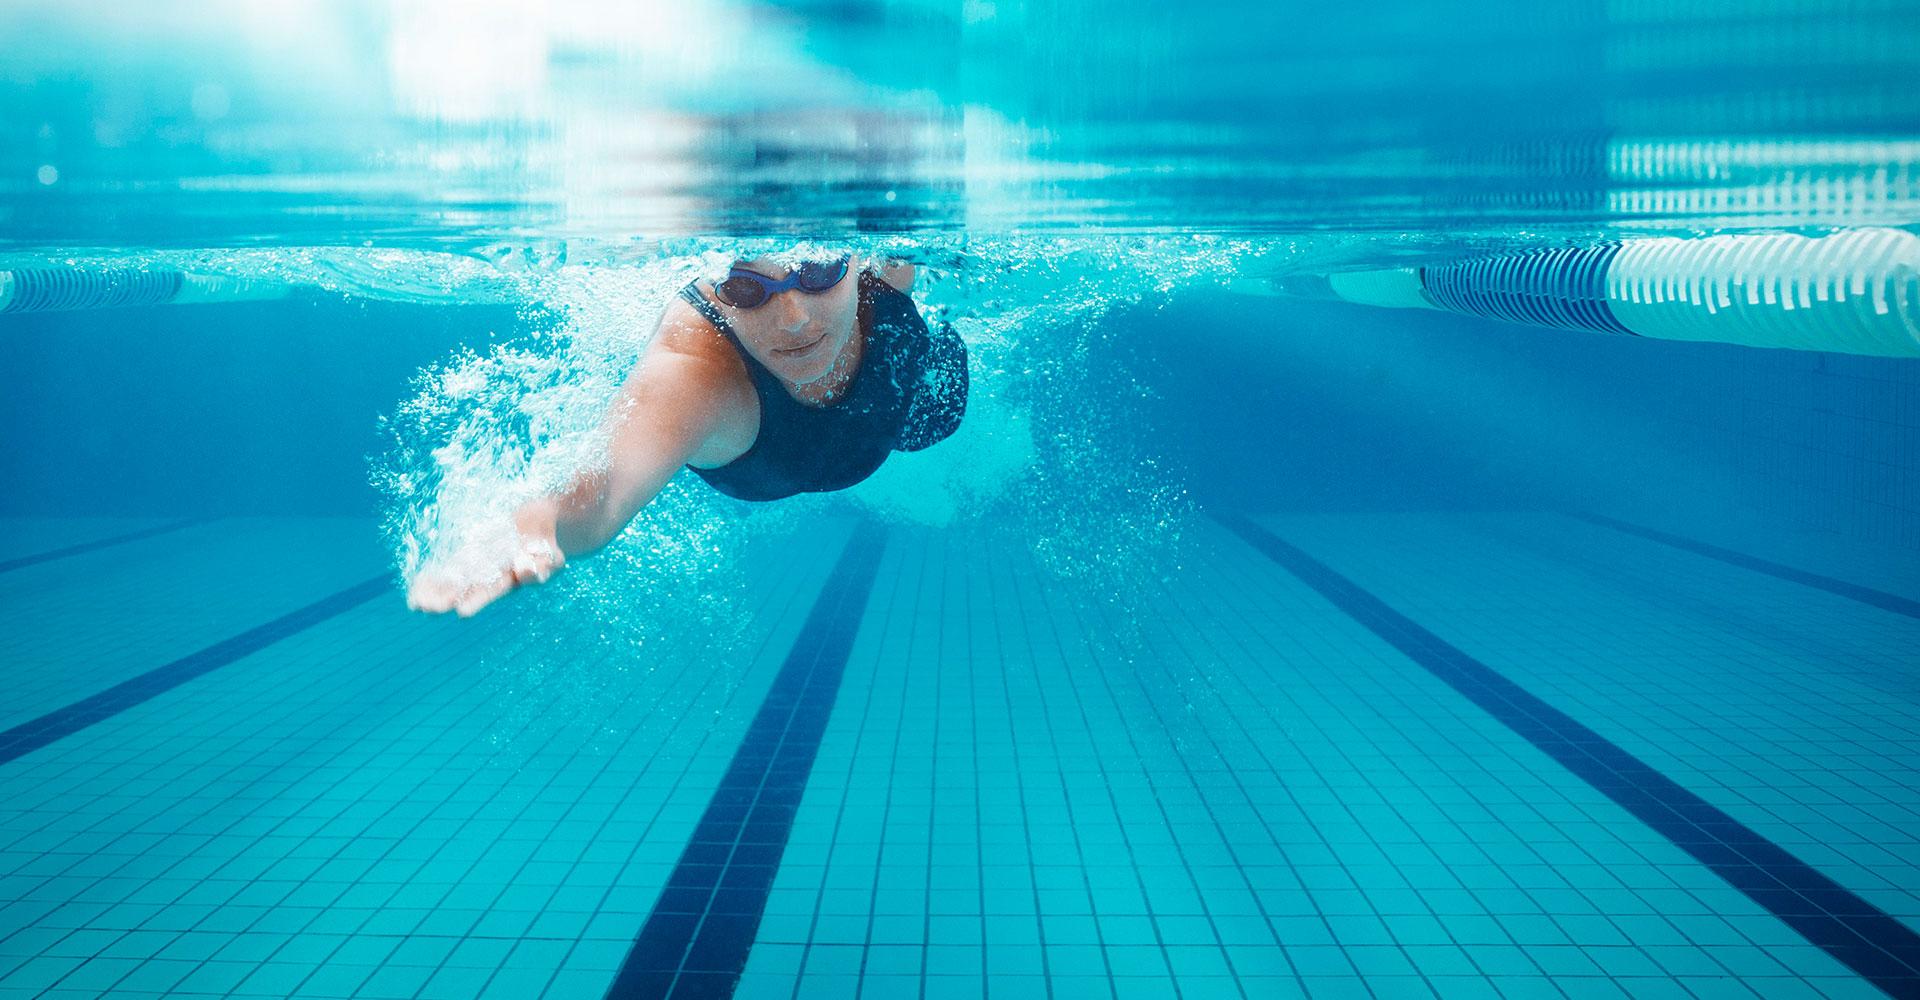 Swimming pool hotels in freetown sierra leone sierra - Cheap hotels in aberdeen with swimming pool ...